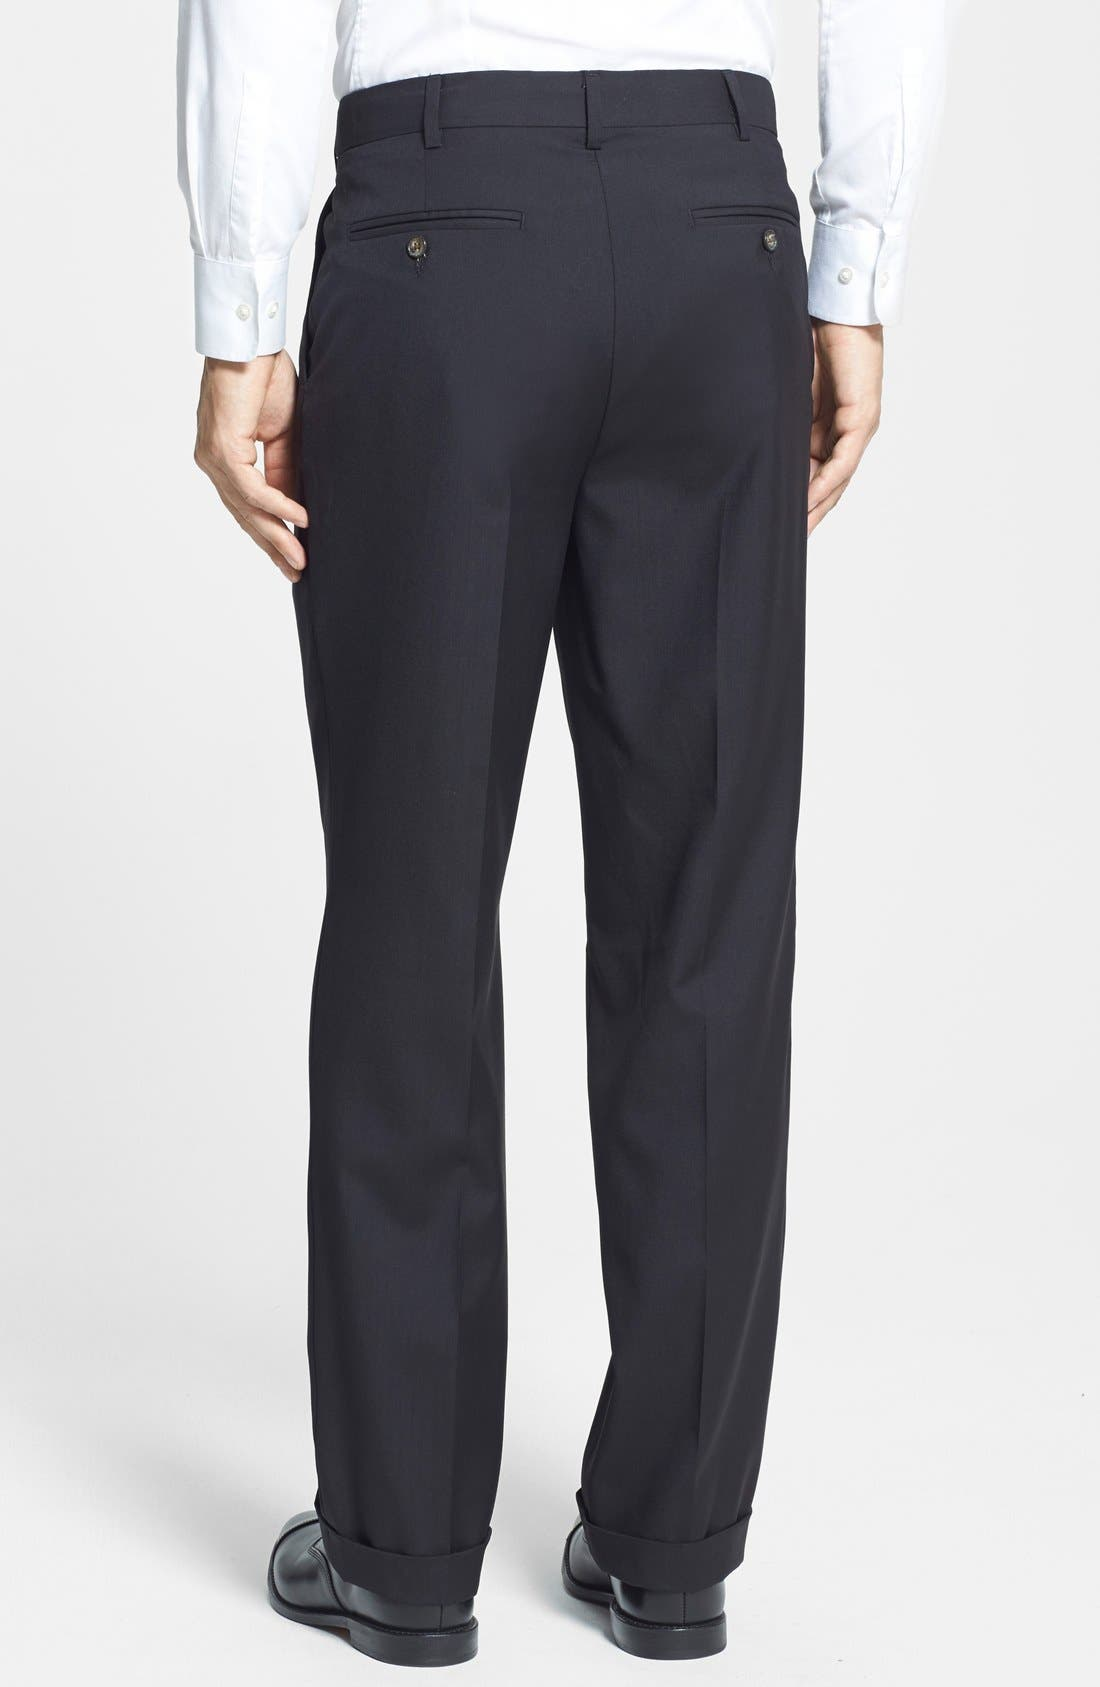 BERLE, Self Sizer Waist Pleated Trousers, Alternate thumbnail 6, color, BLACK